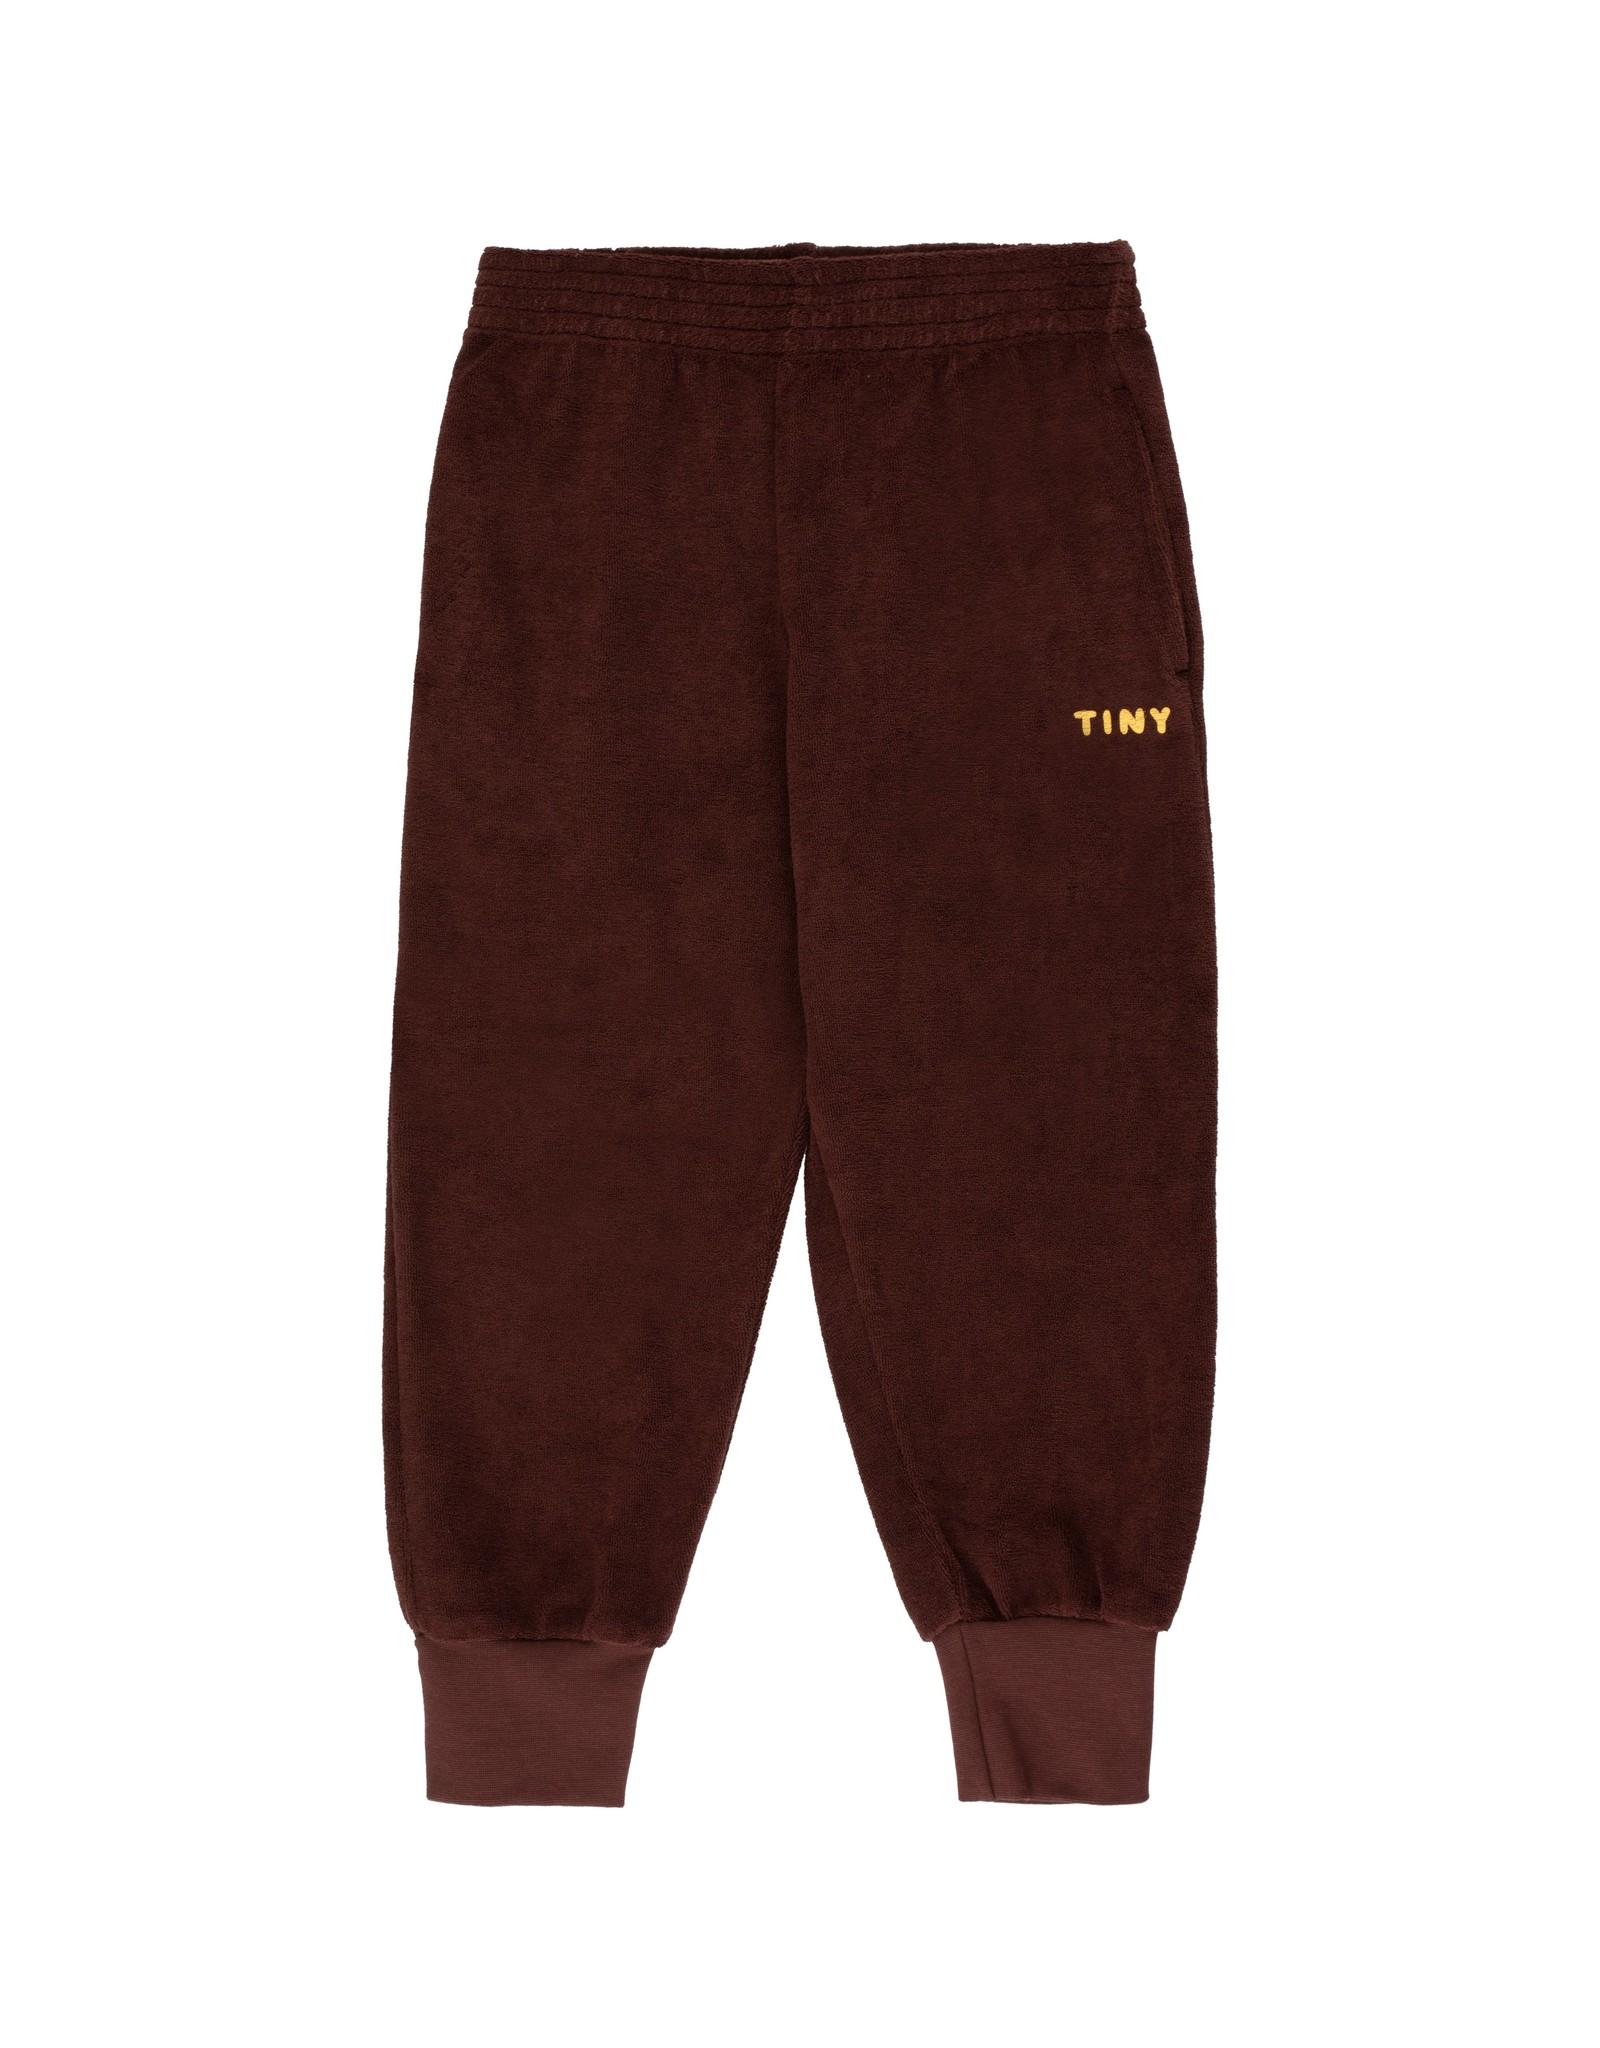 "Tinycottons ""TINY"" sweatpant"